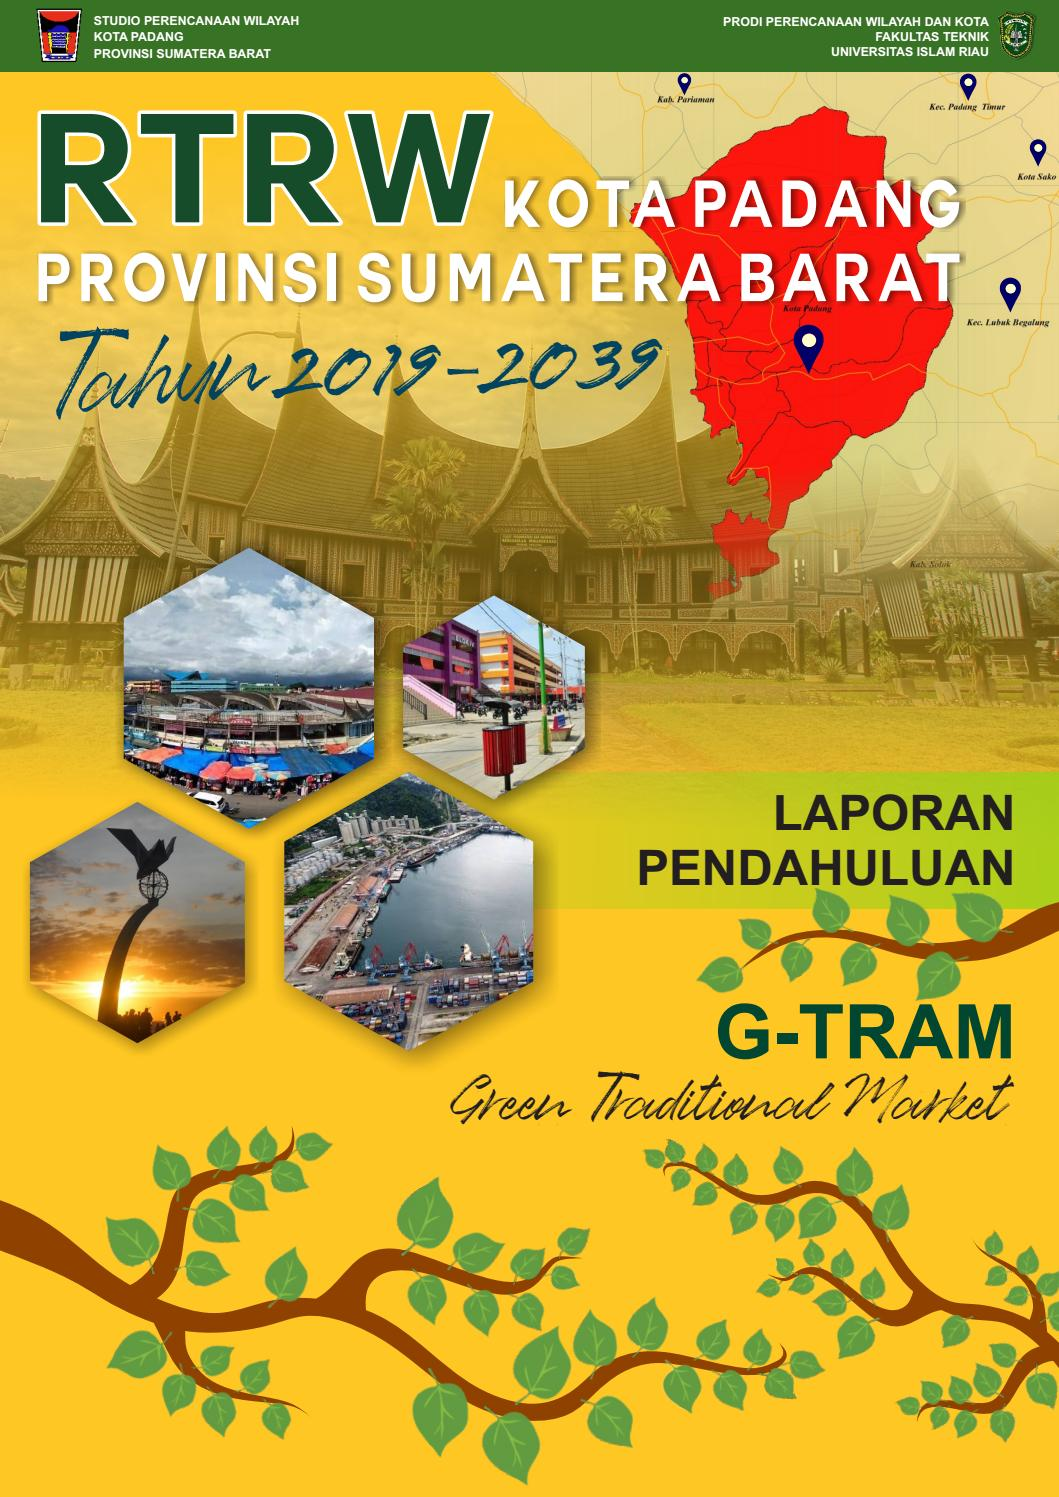 Laporan Pendahuluan Studio Perencanaan Wilayah Universitas Islam Riau By Pwk16a Issuu